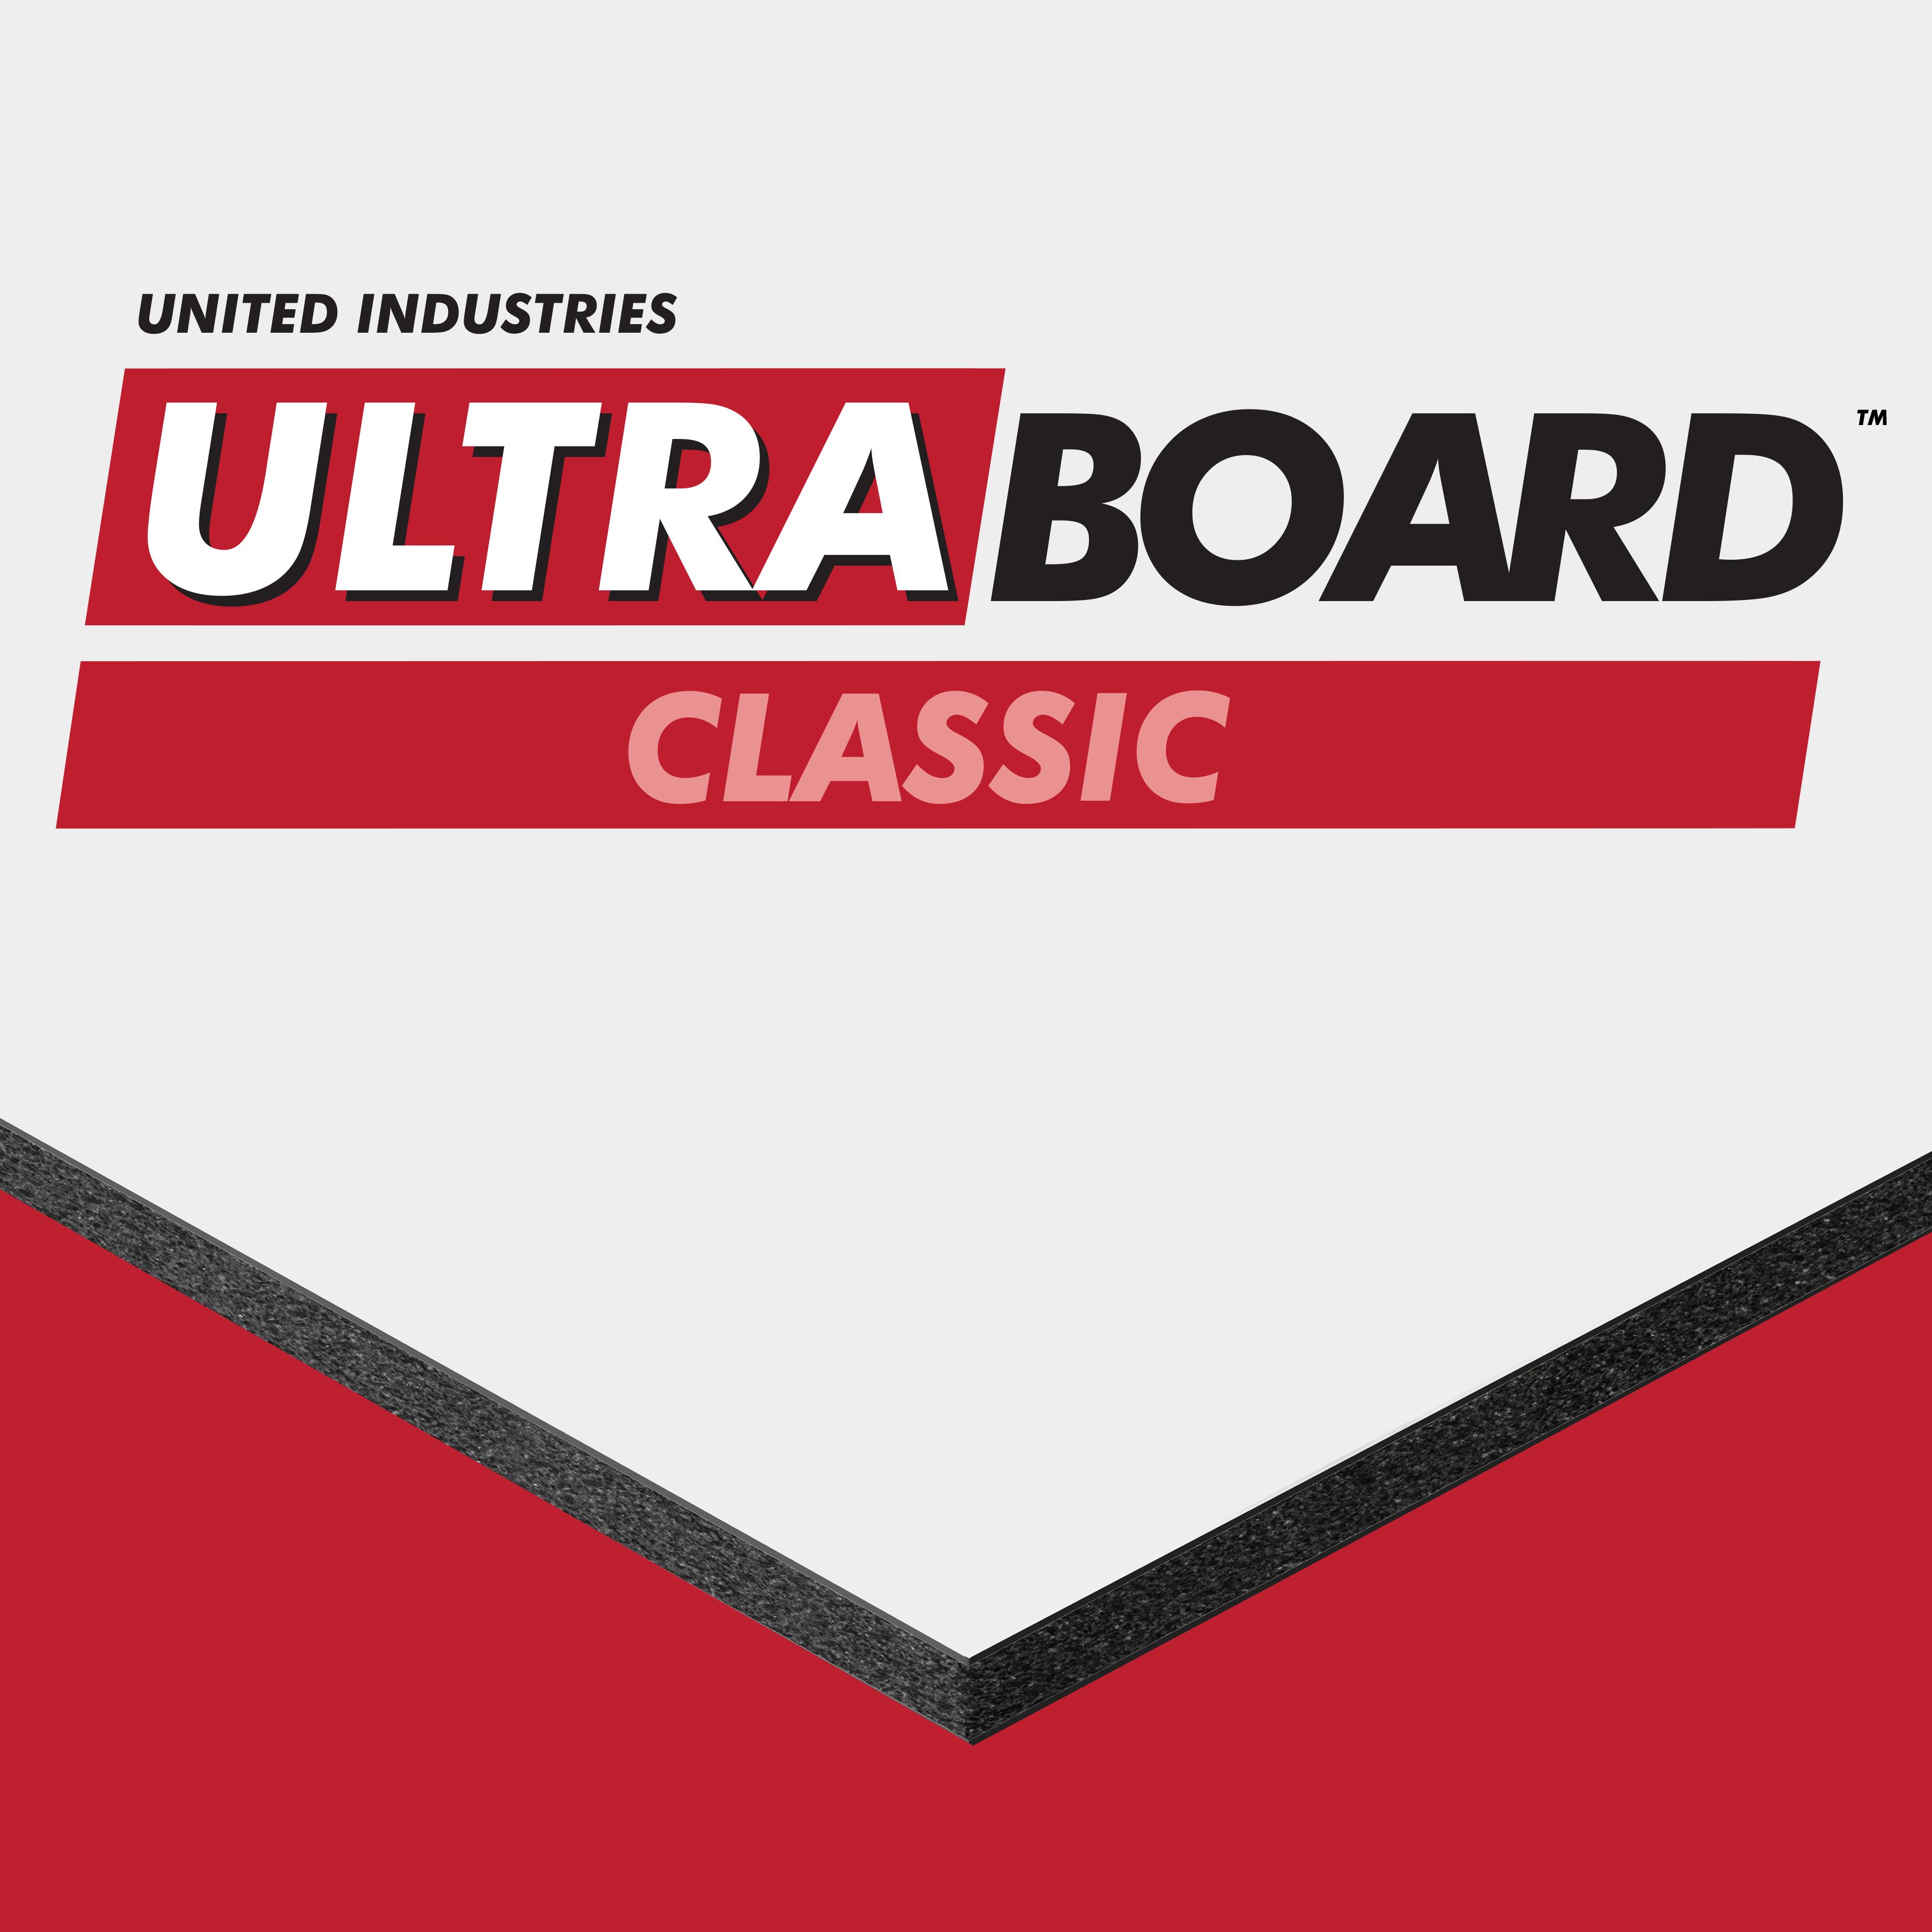 UltraBoard Classic